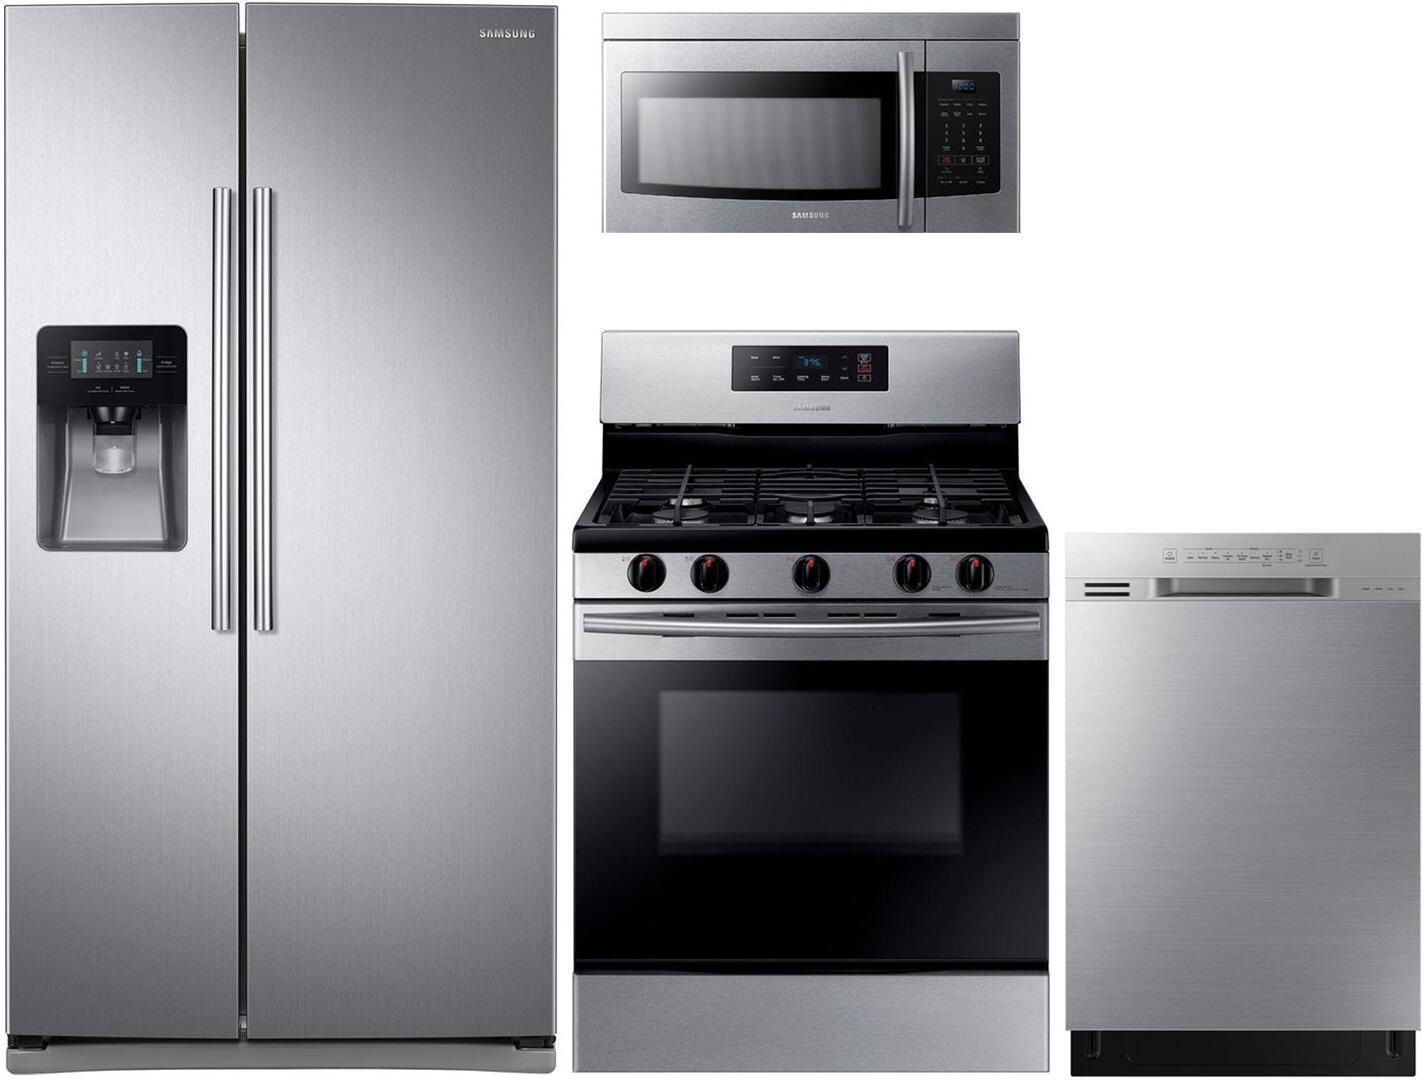 Samsung 1000683 4 piece Stainless Steel Kitchen Appliances Package